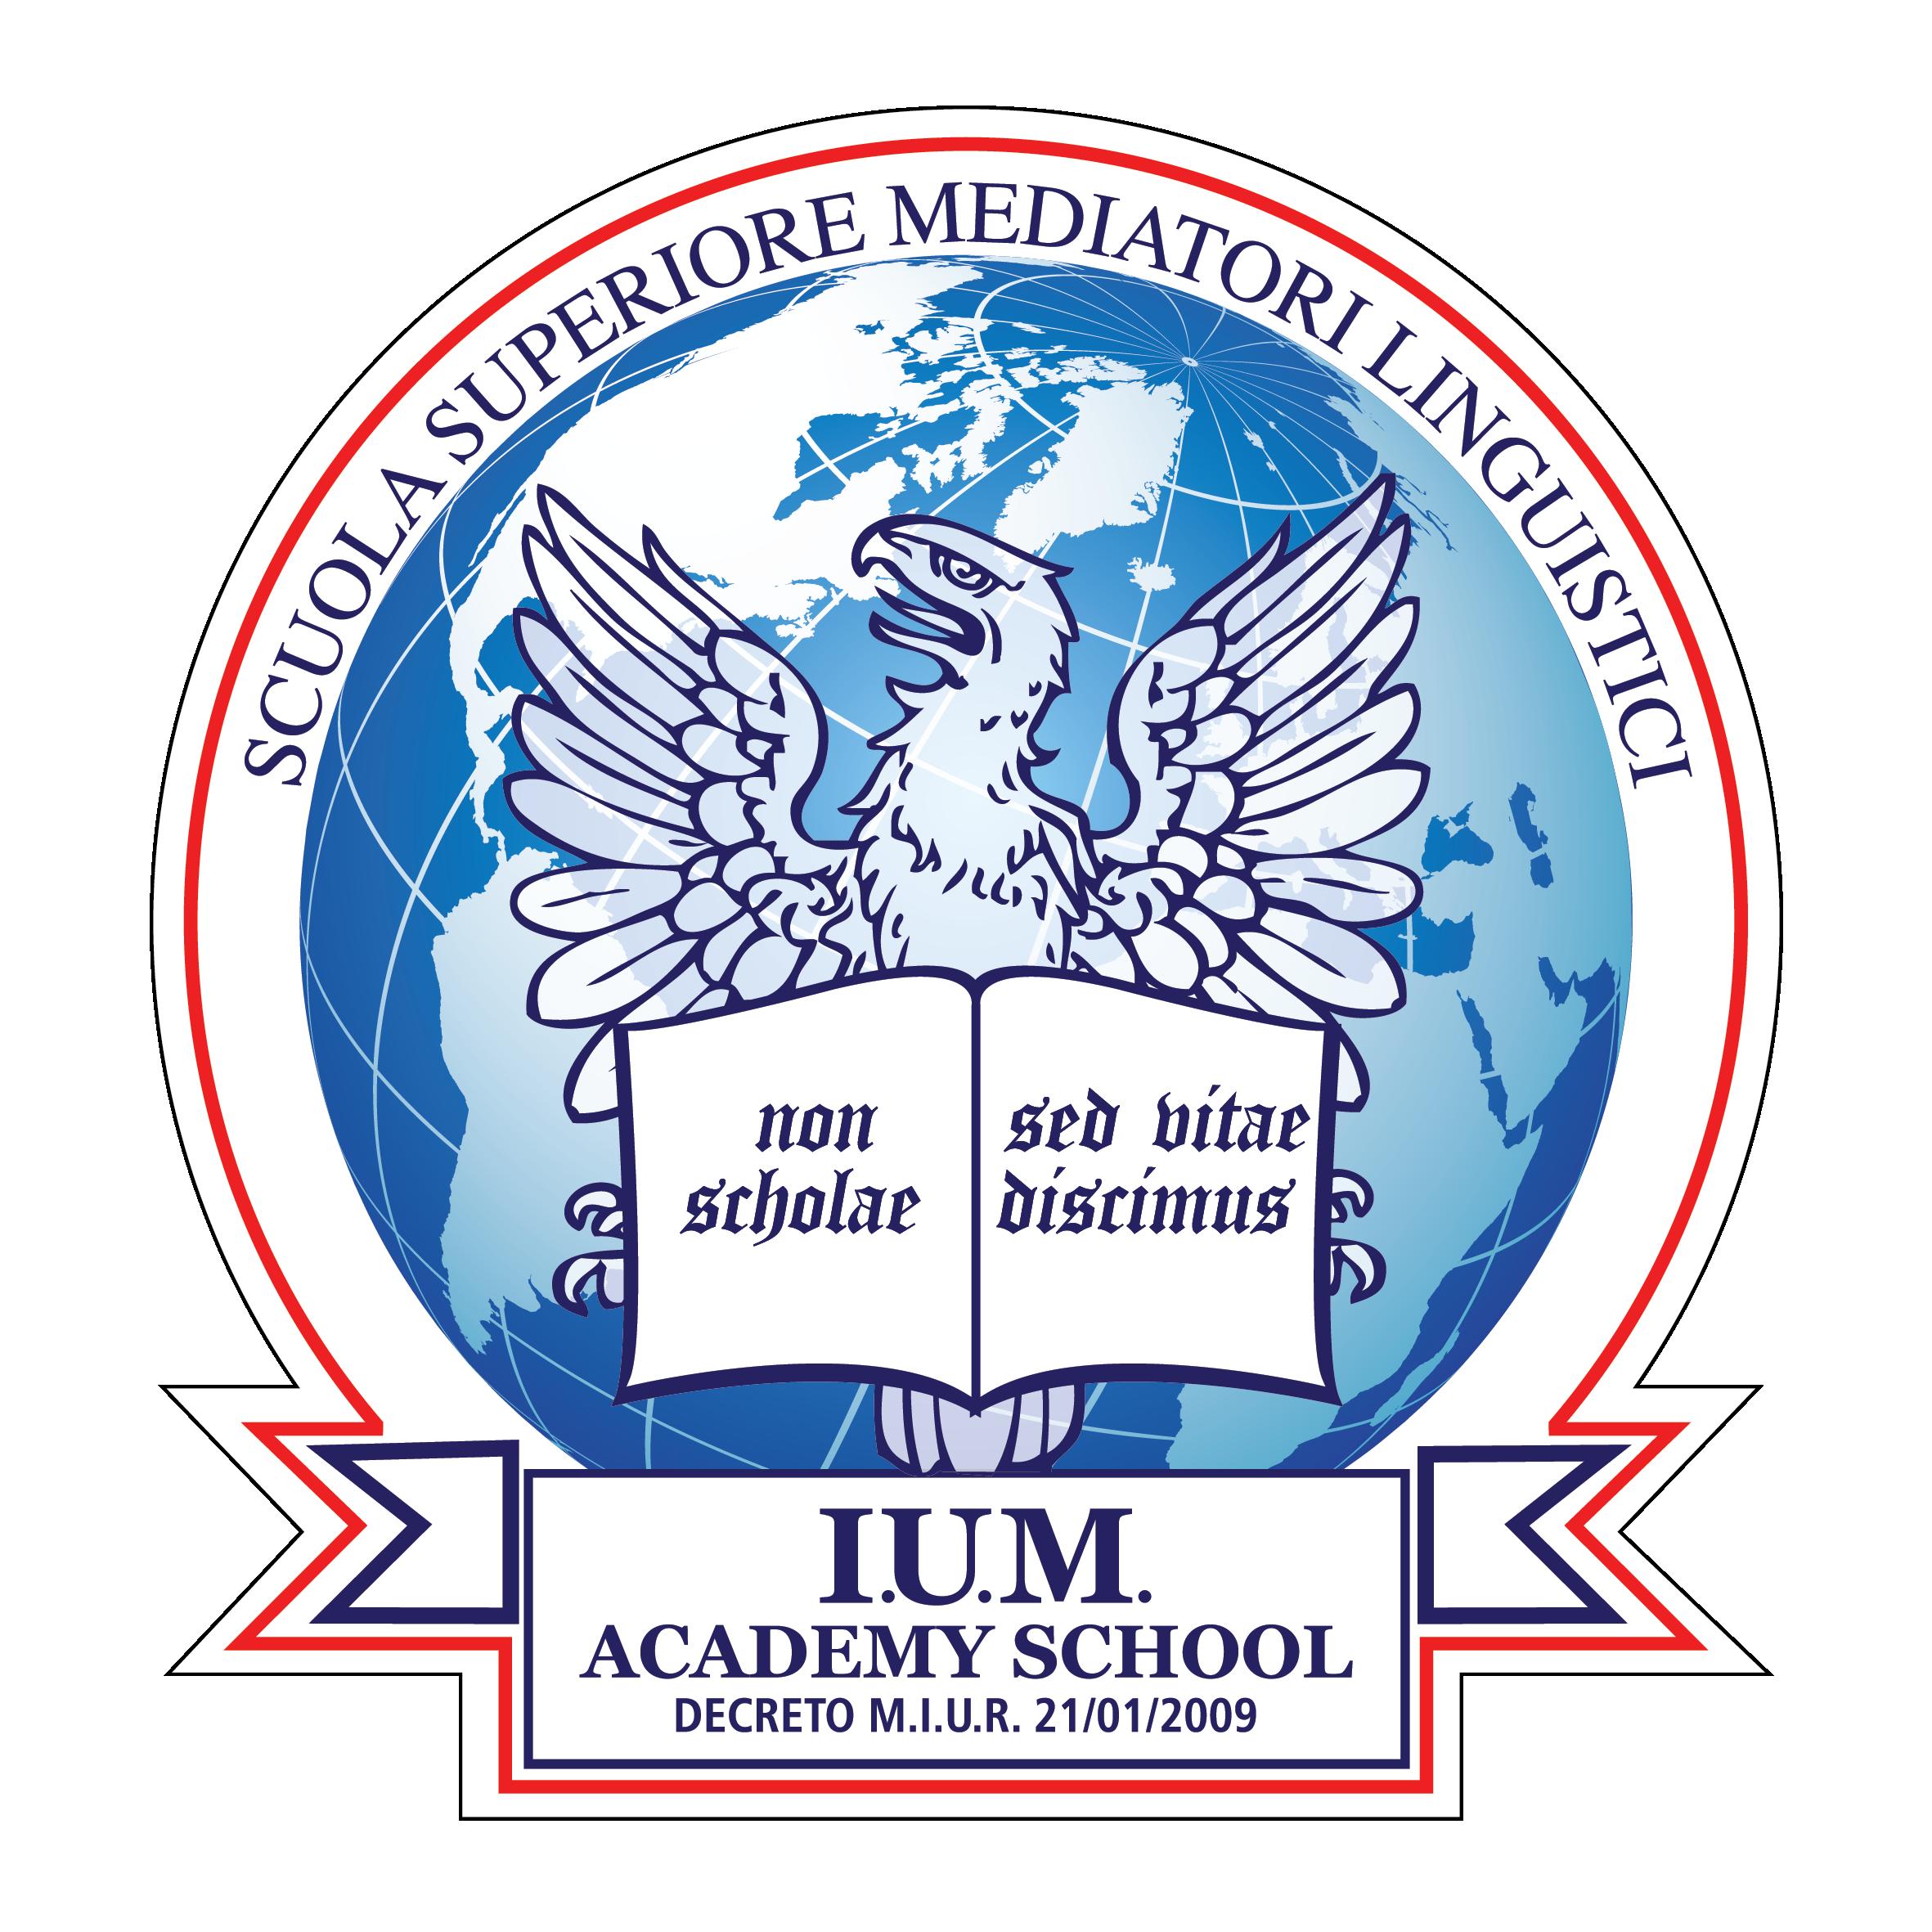 IUM Academy School